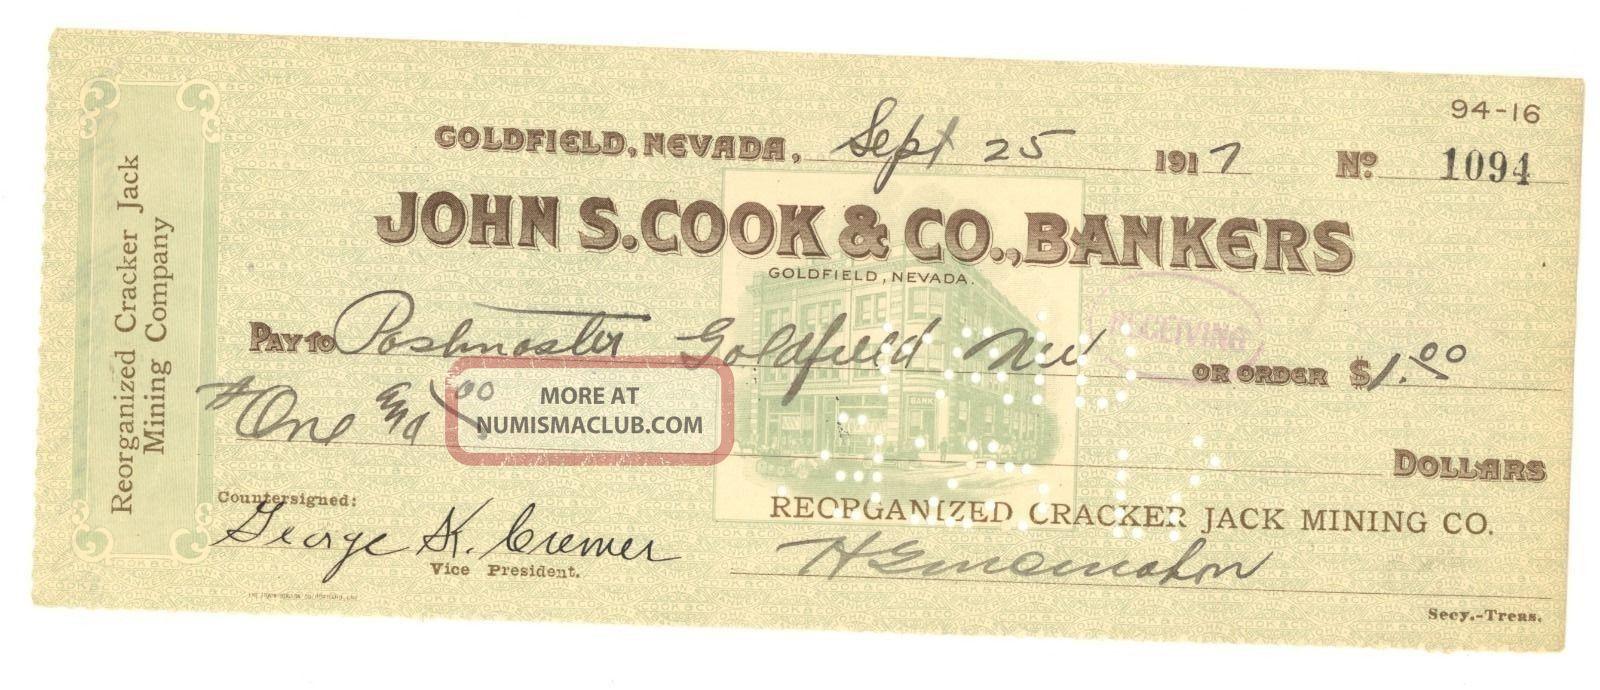 1917 Reorganized Cracker Jack Mining Co.  - Check 1094 - Goldfield,  Nevada Stocks & Bonds, Scripophily photo